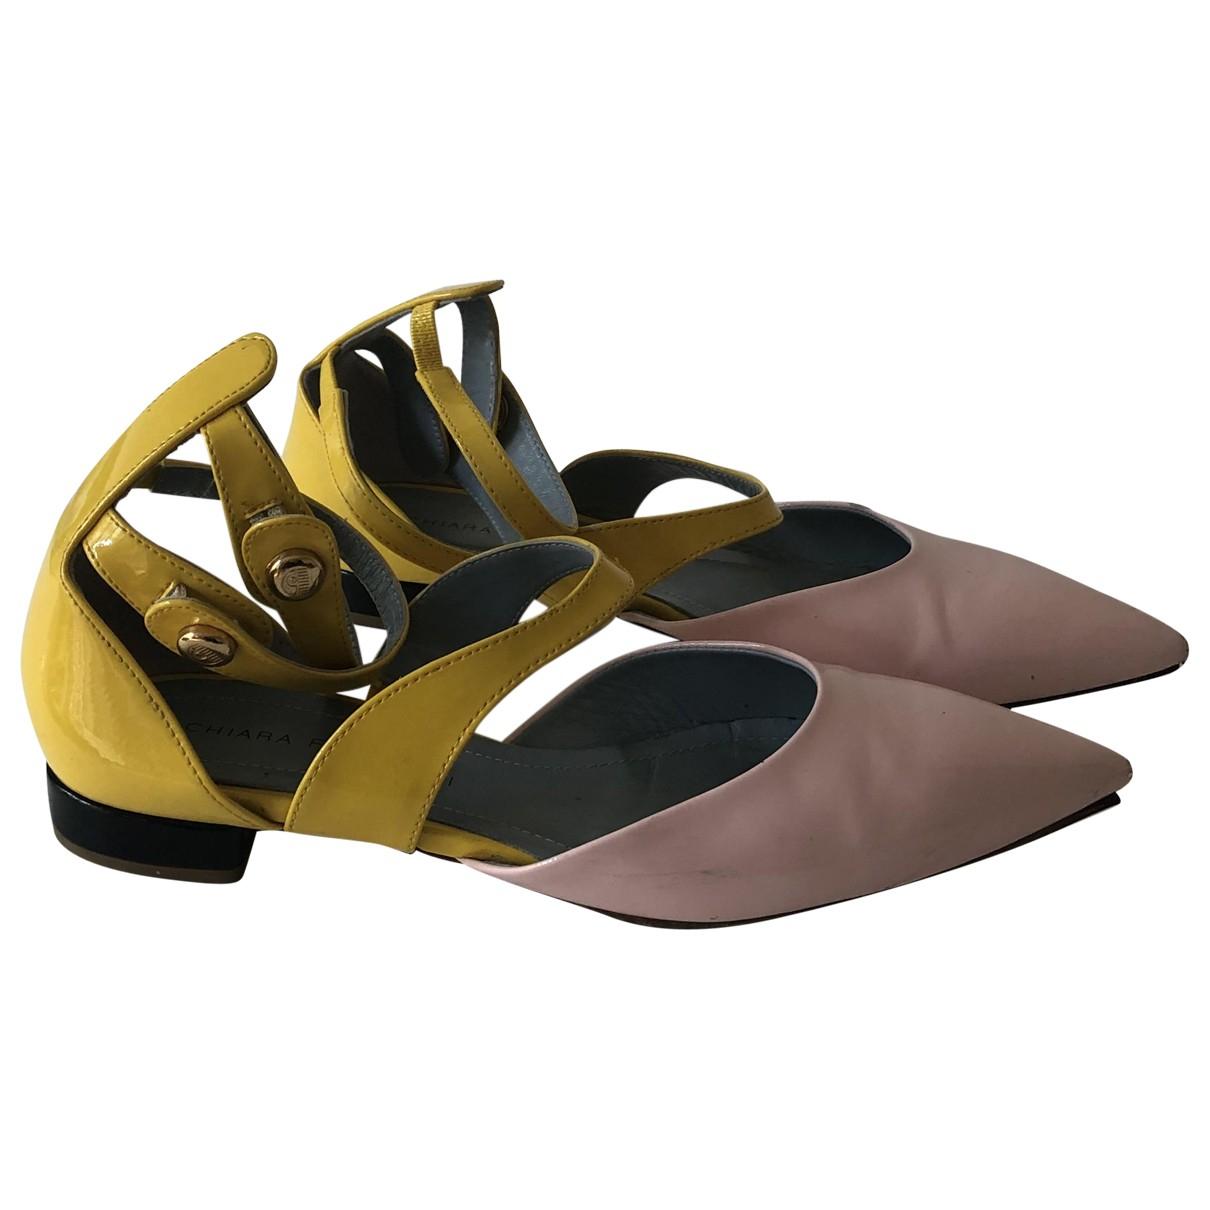 Chiara Ferragni \N Ballerinas in  Gelb Lackleder